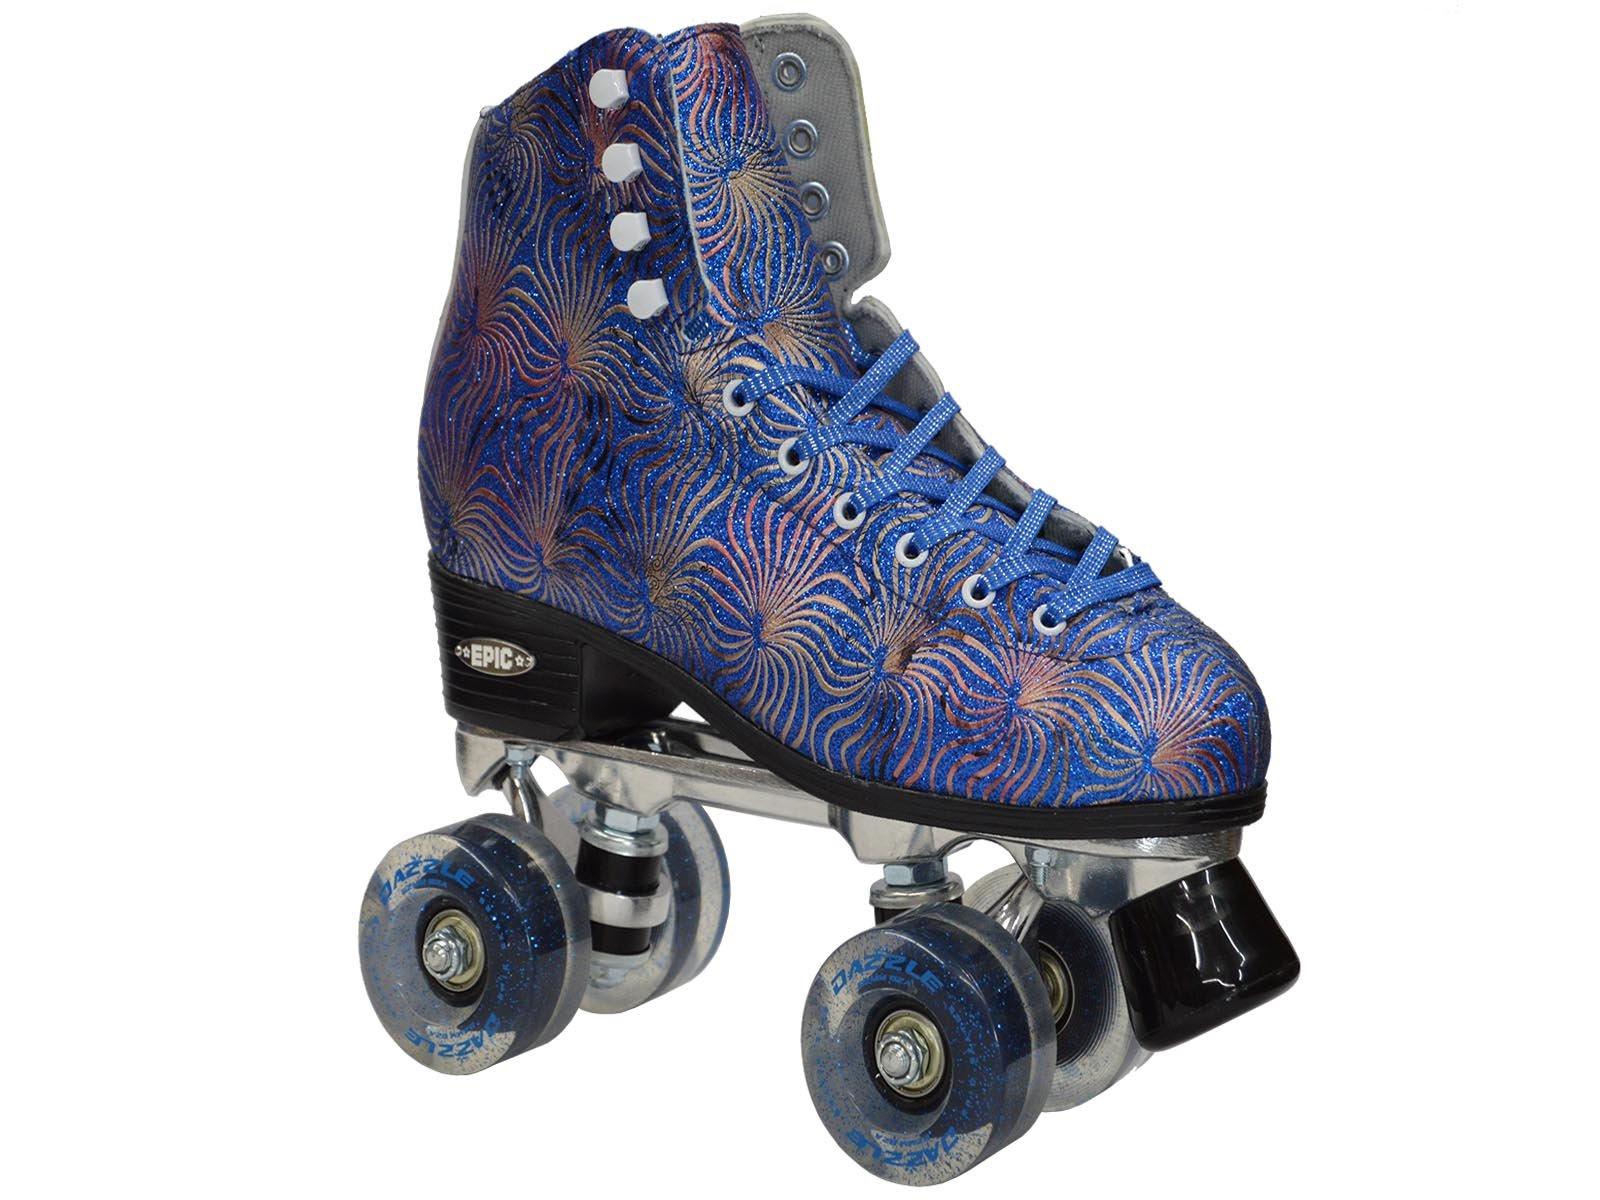 Epic Skates Dazzle10 Quad Roller Skates, Blue by Epic Skates